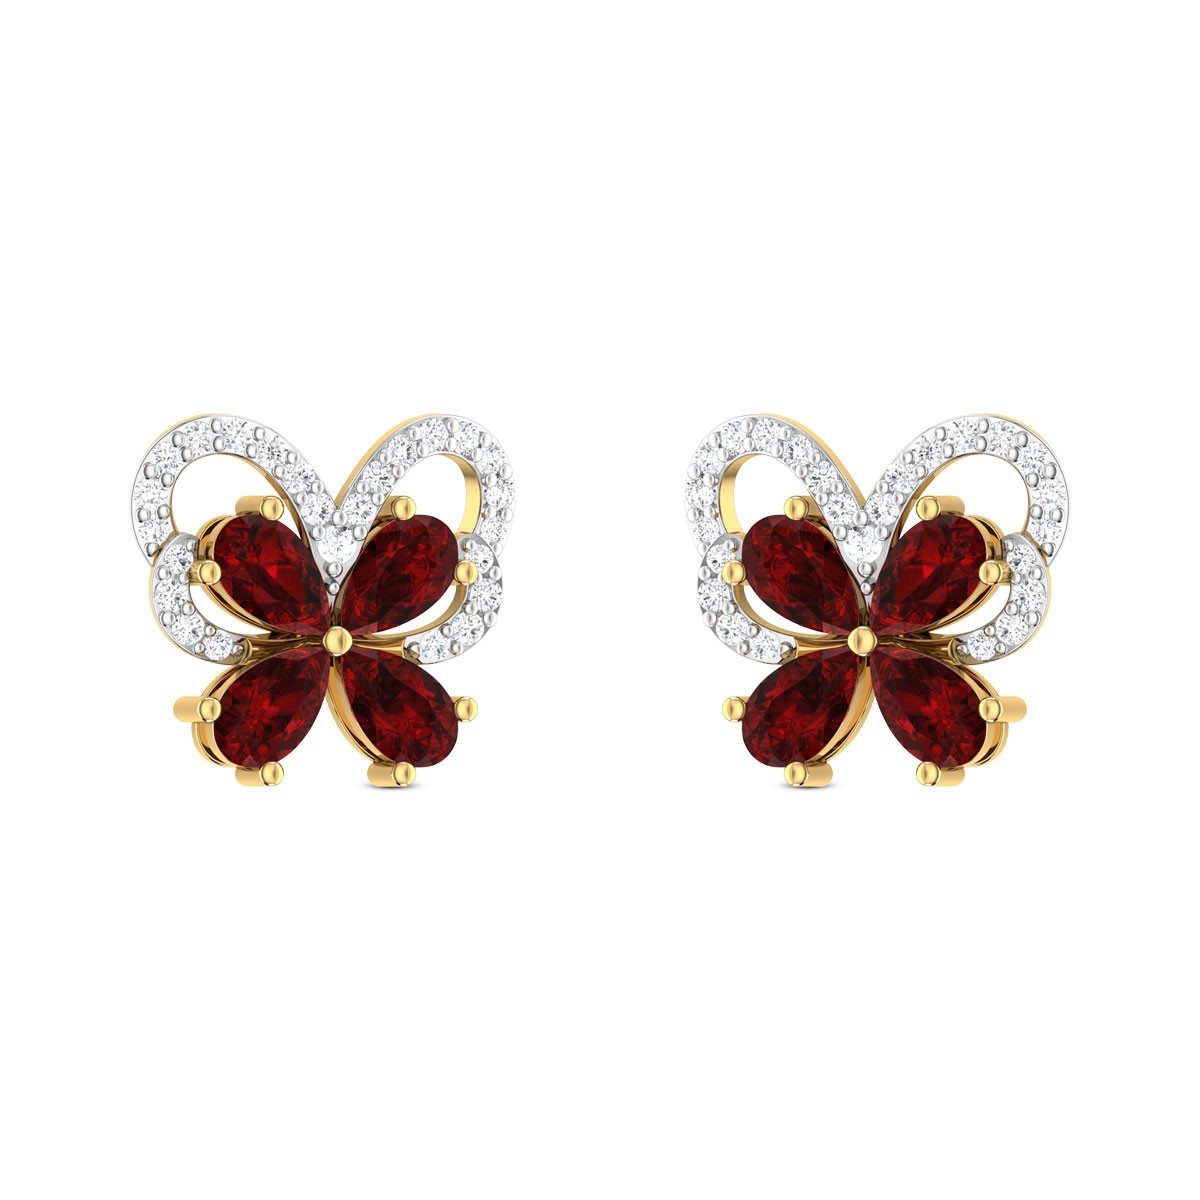 Briony Stud Earrings